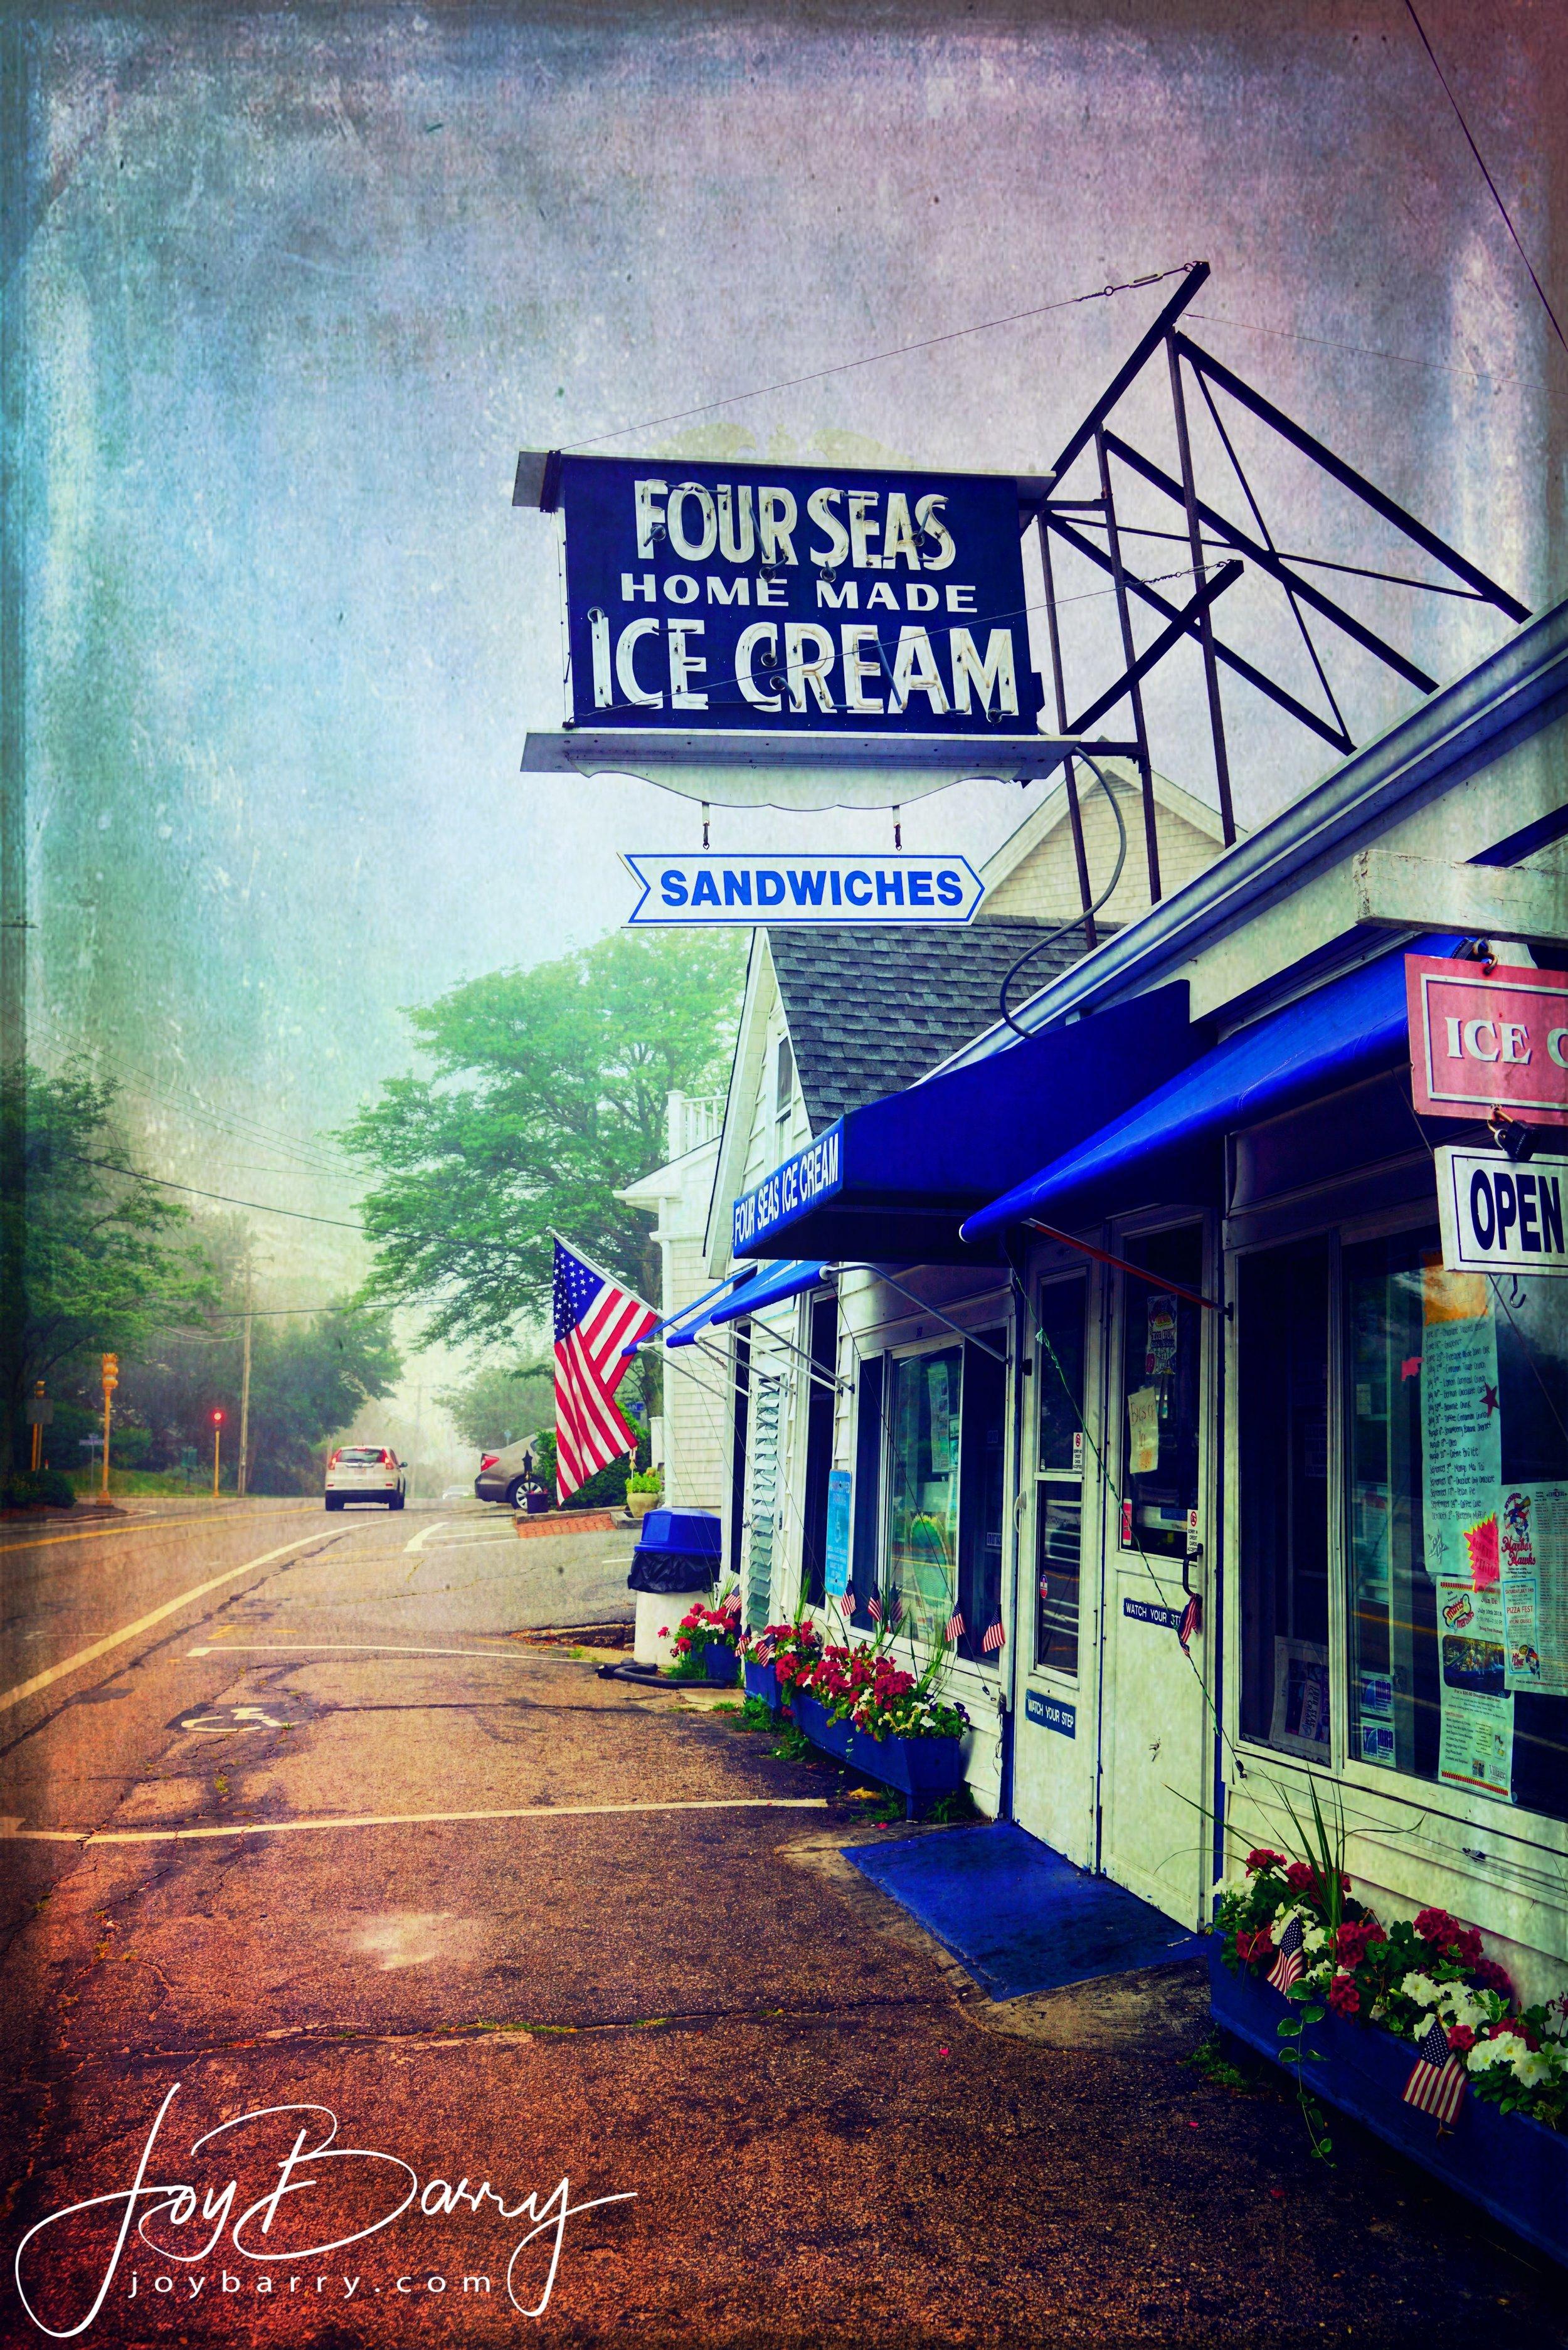 January 11, 2019 - Famous local ice cream shop (Four Seas Ice Cream in Centerville, Massachusetts).